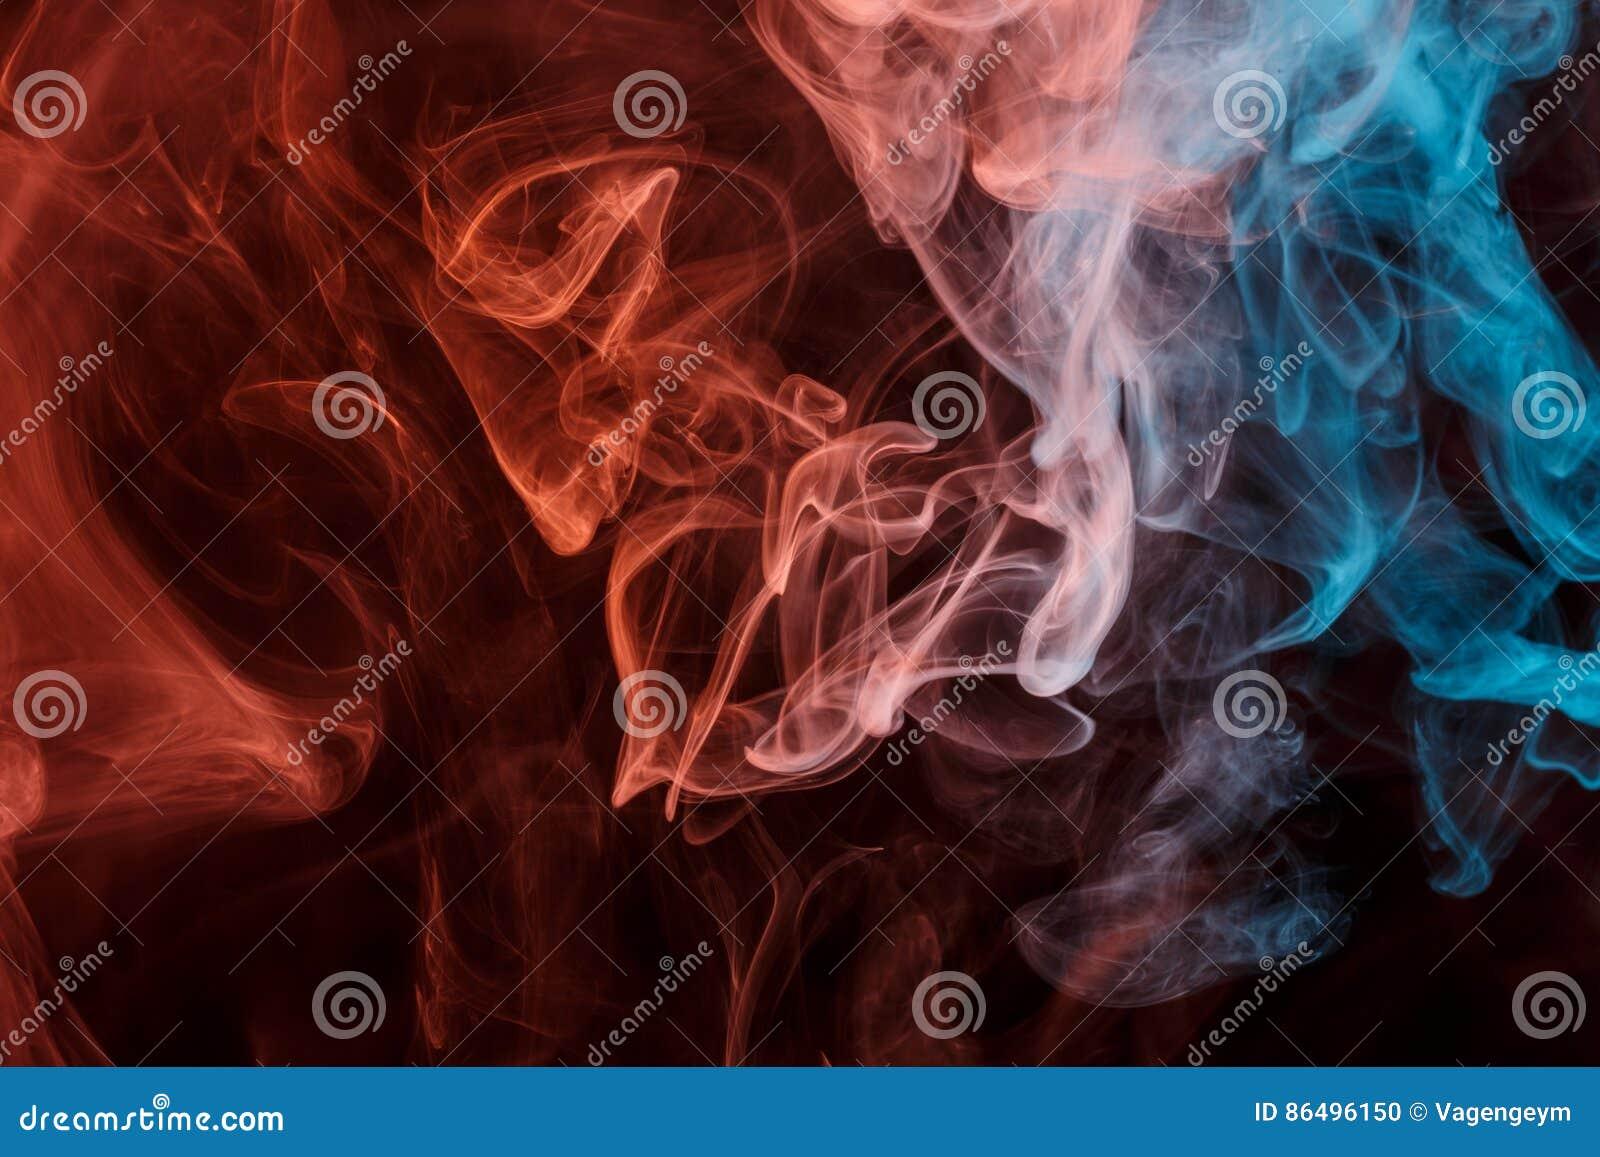 Abstract Orange Blue Smoke Weipa Stock Photo - Image of